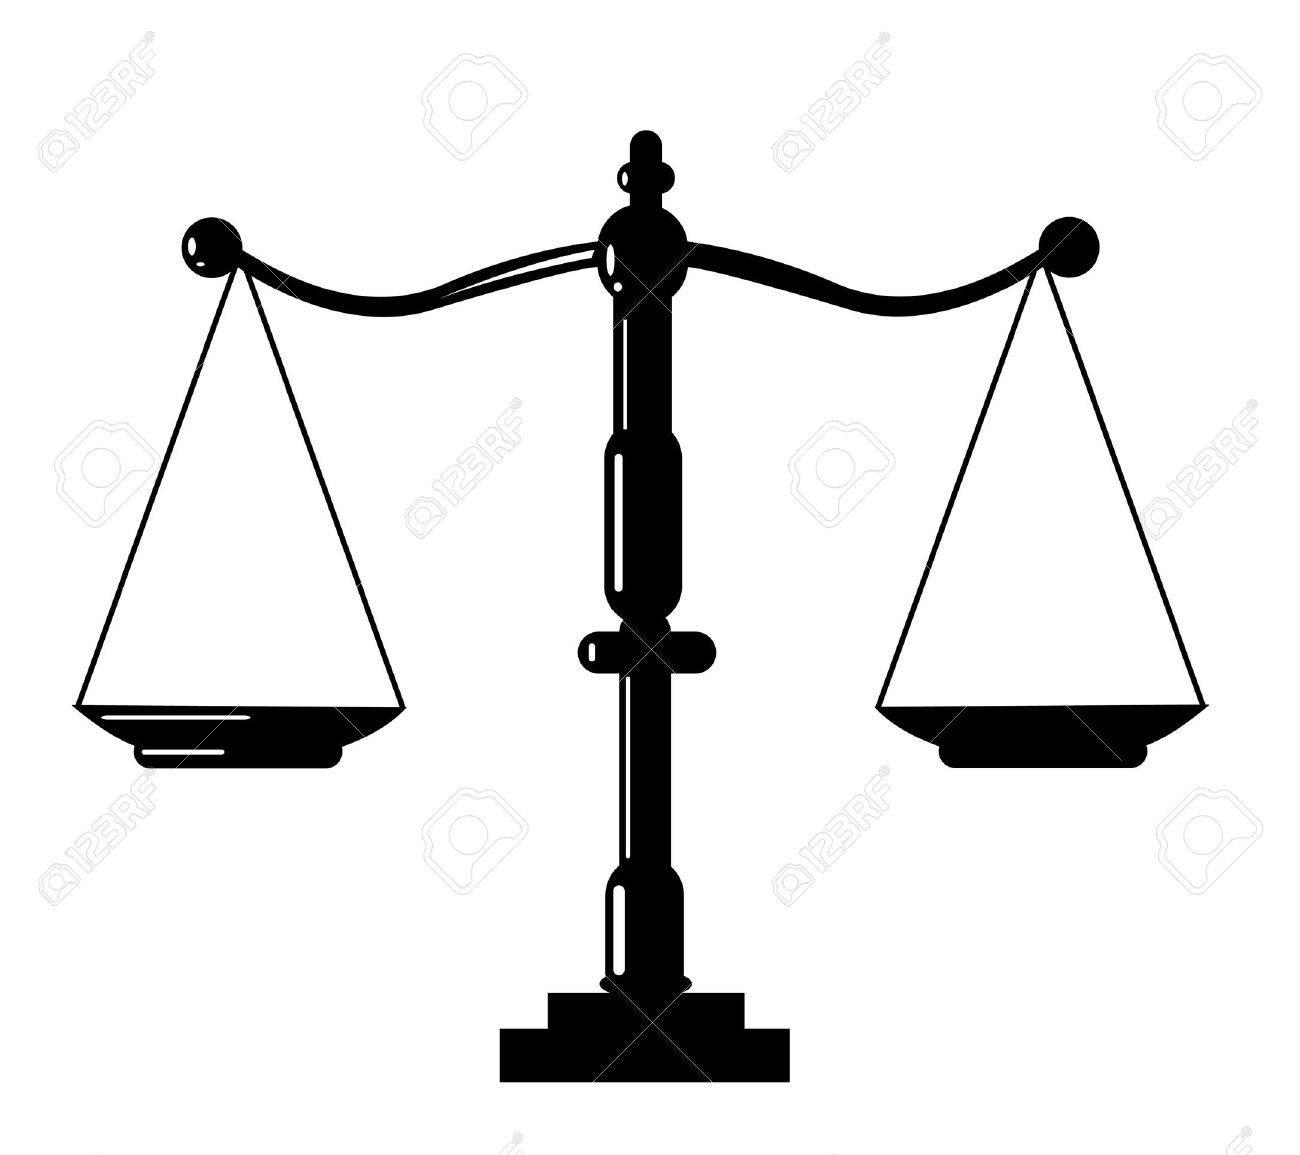 Justice scale icon - 31063659